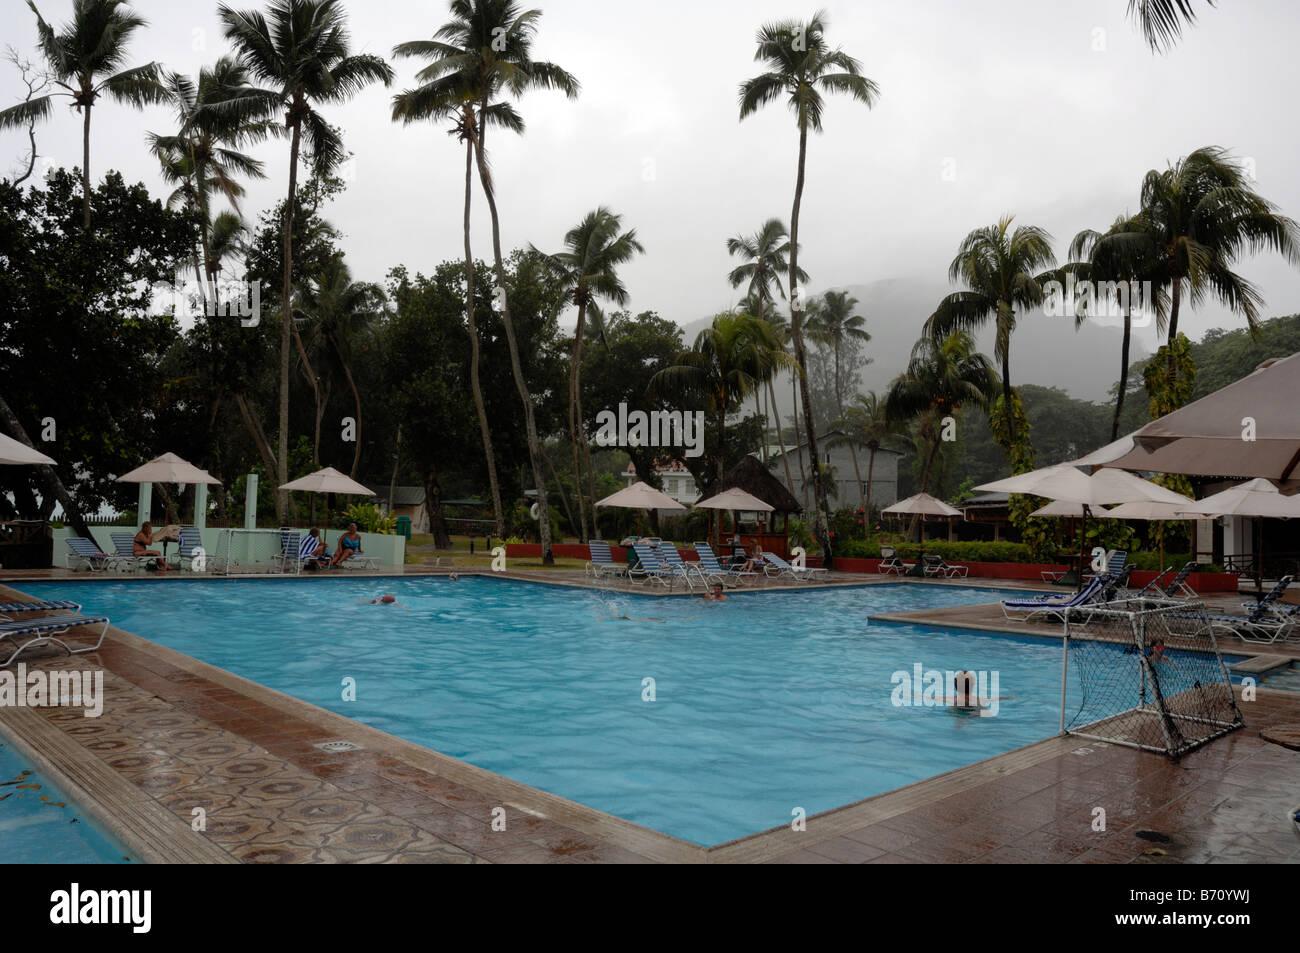 Tropical Rainstorm Hotel Swimming Pool Mahe Seychelles Indian Ocean Stock Photo Royalty Free